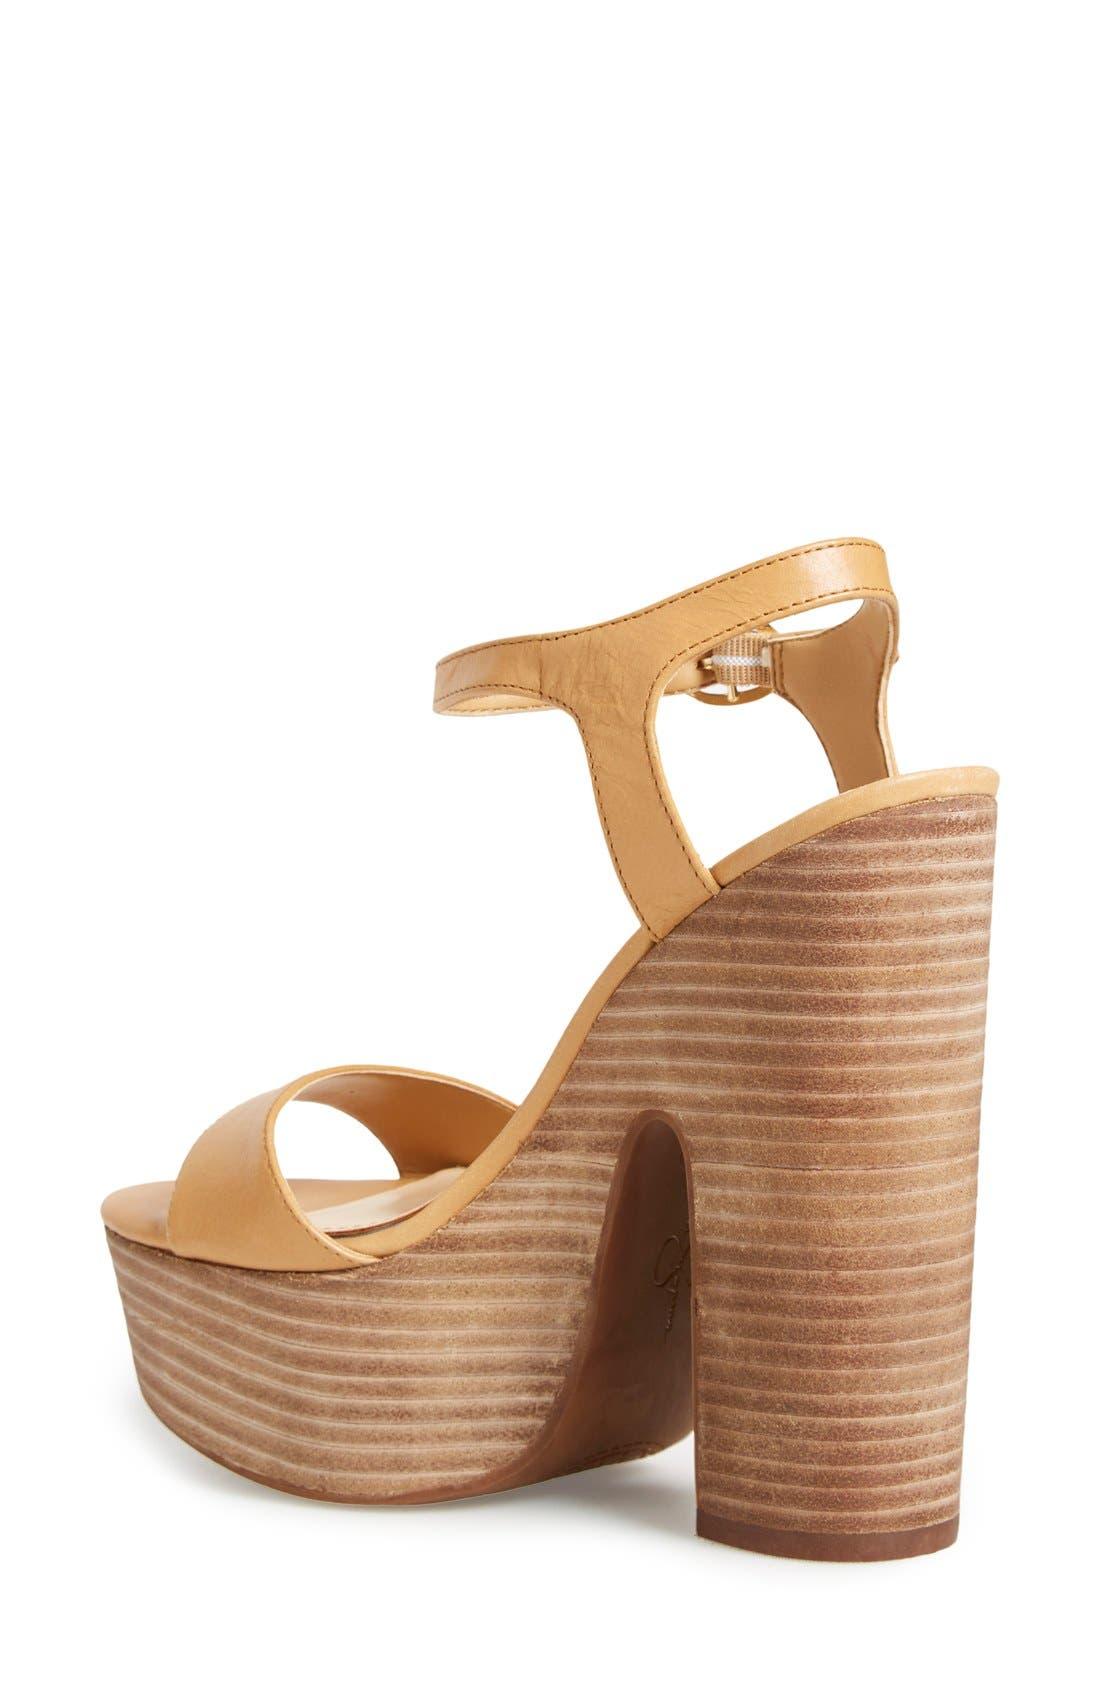 'Whirl' Platform Sandal,                             Alternate thumbnail 2, color,                             281